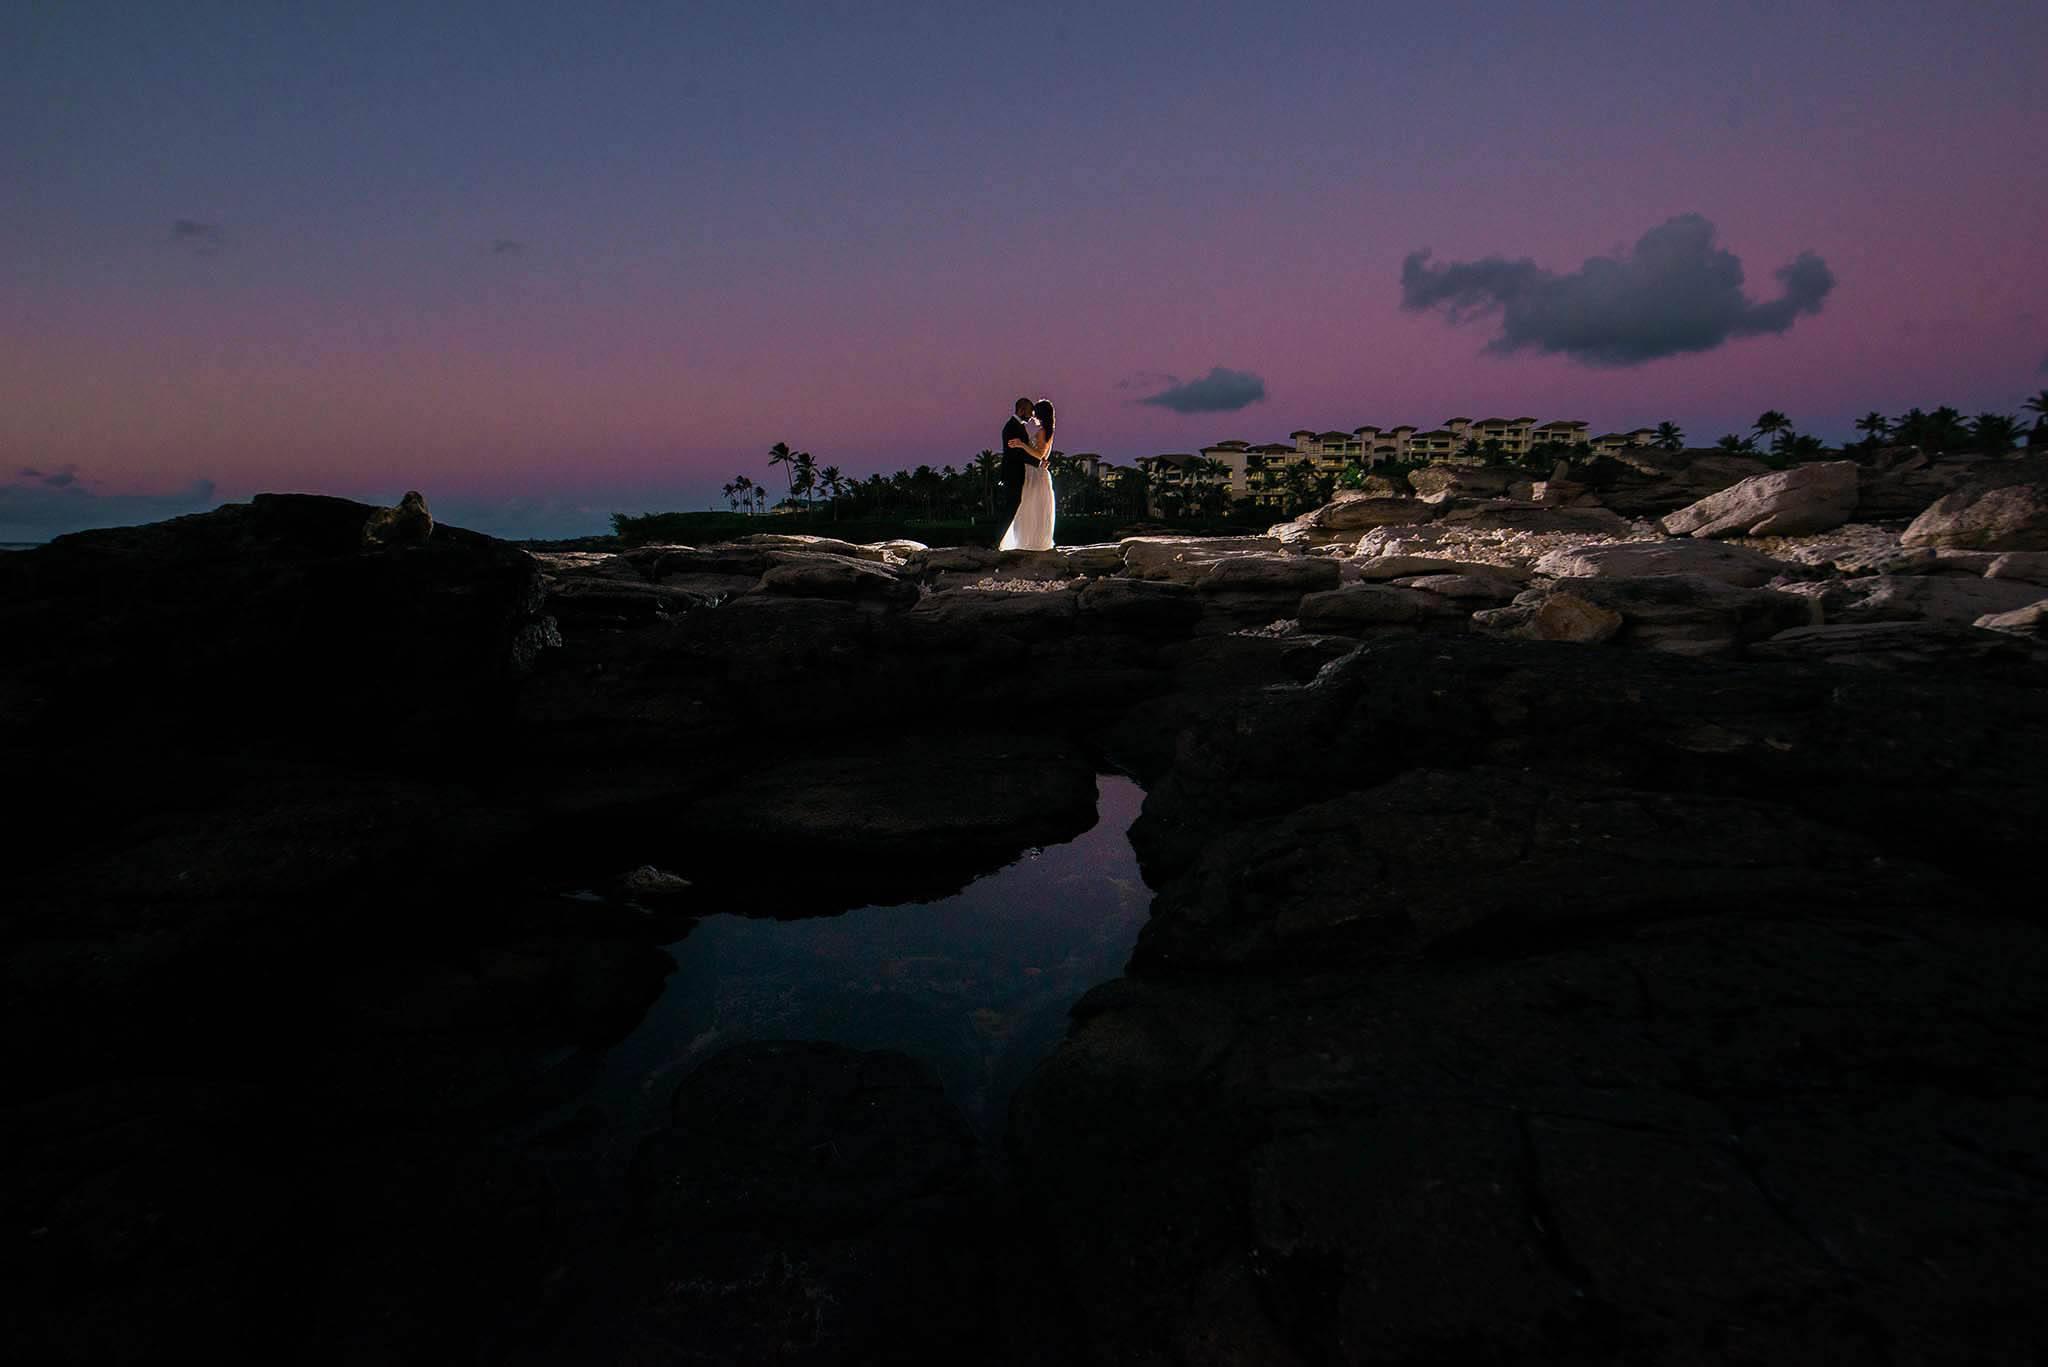 maui wedding at sunset at merrimans kapalua